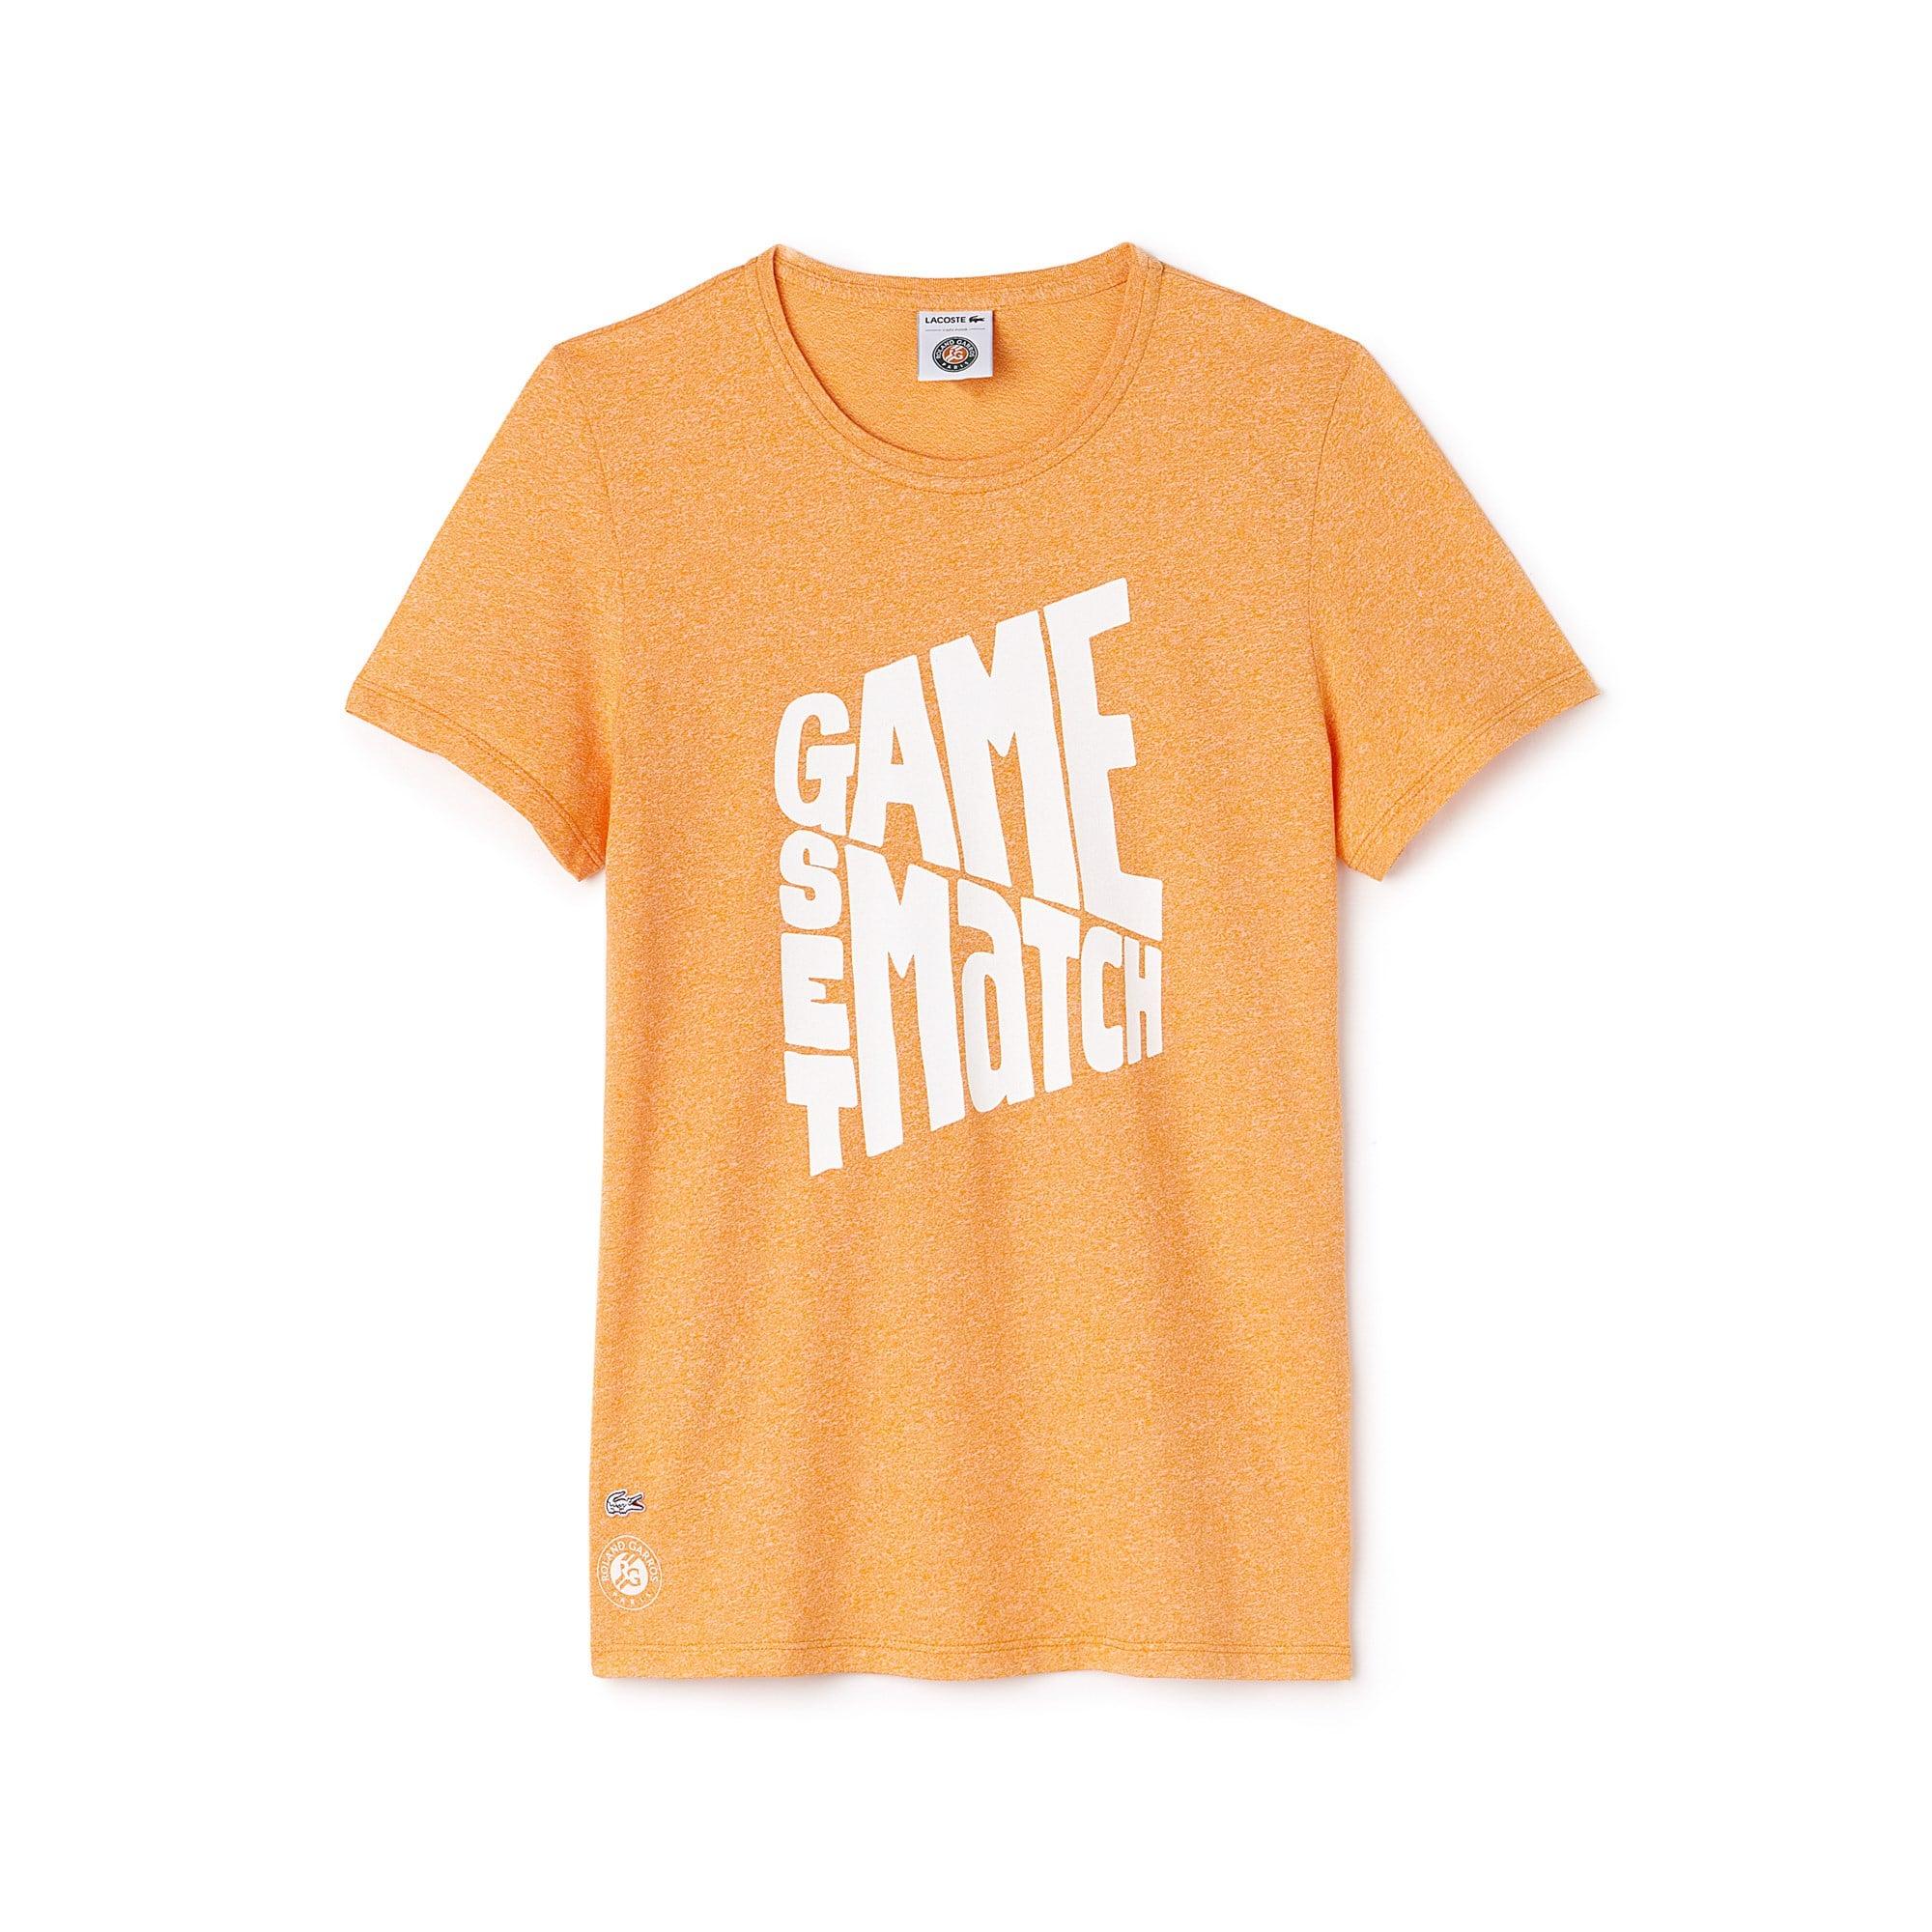 Damen LACOSTE SPORT Roland Garros Edition Design-Jersey-T-Shirt